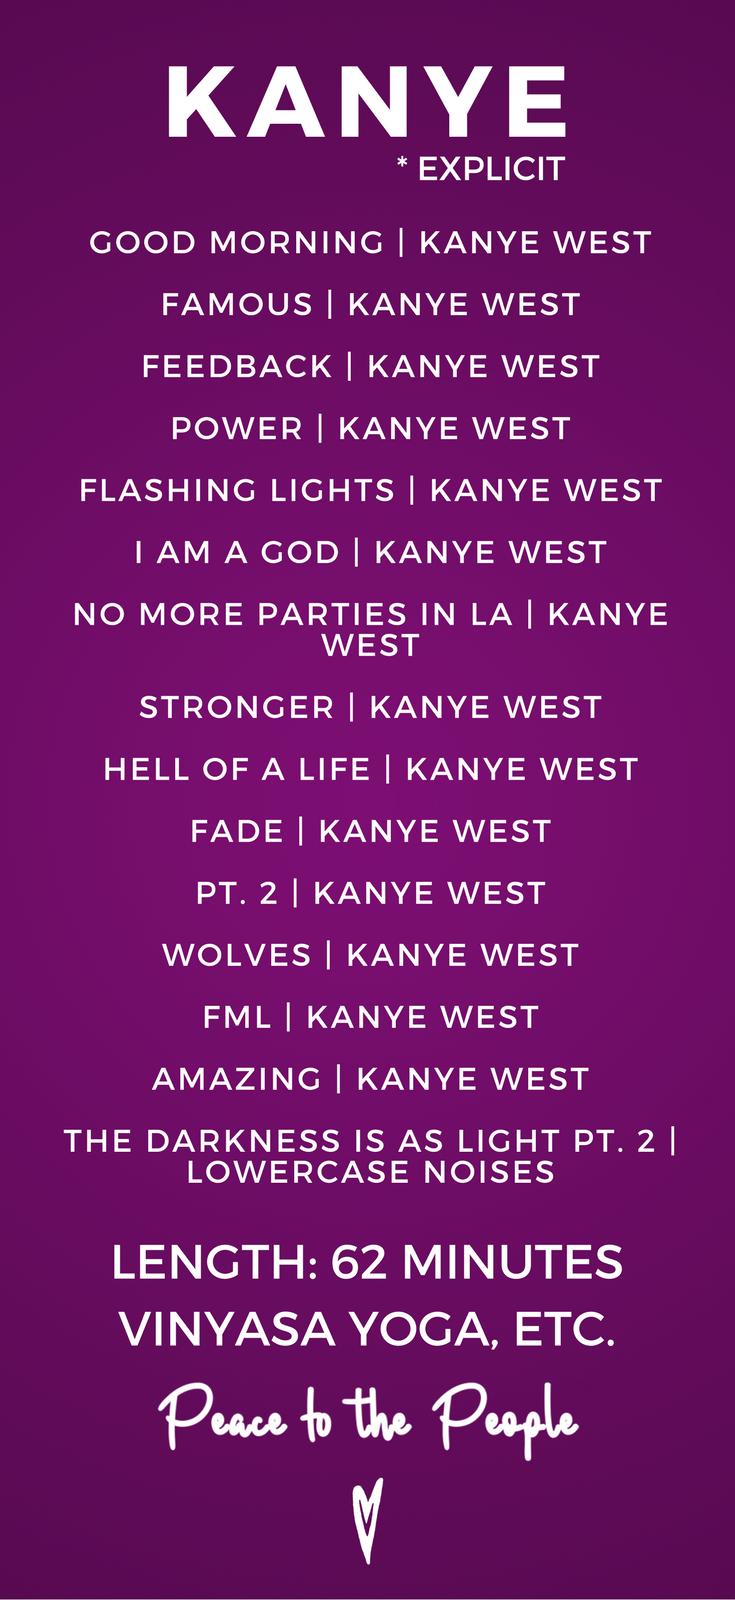 Kanye West Yoga Fitness Playlist Peace To The People Music Blog Running Kanye West Stronger Trip Hop Kanye West Power